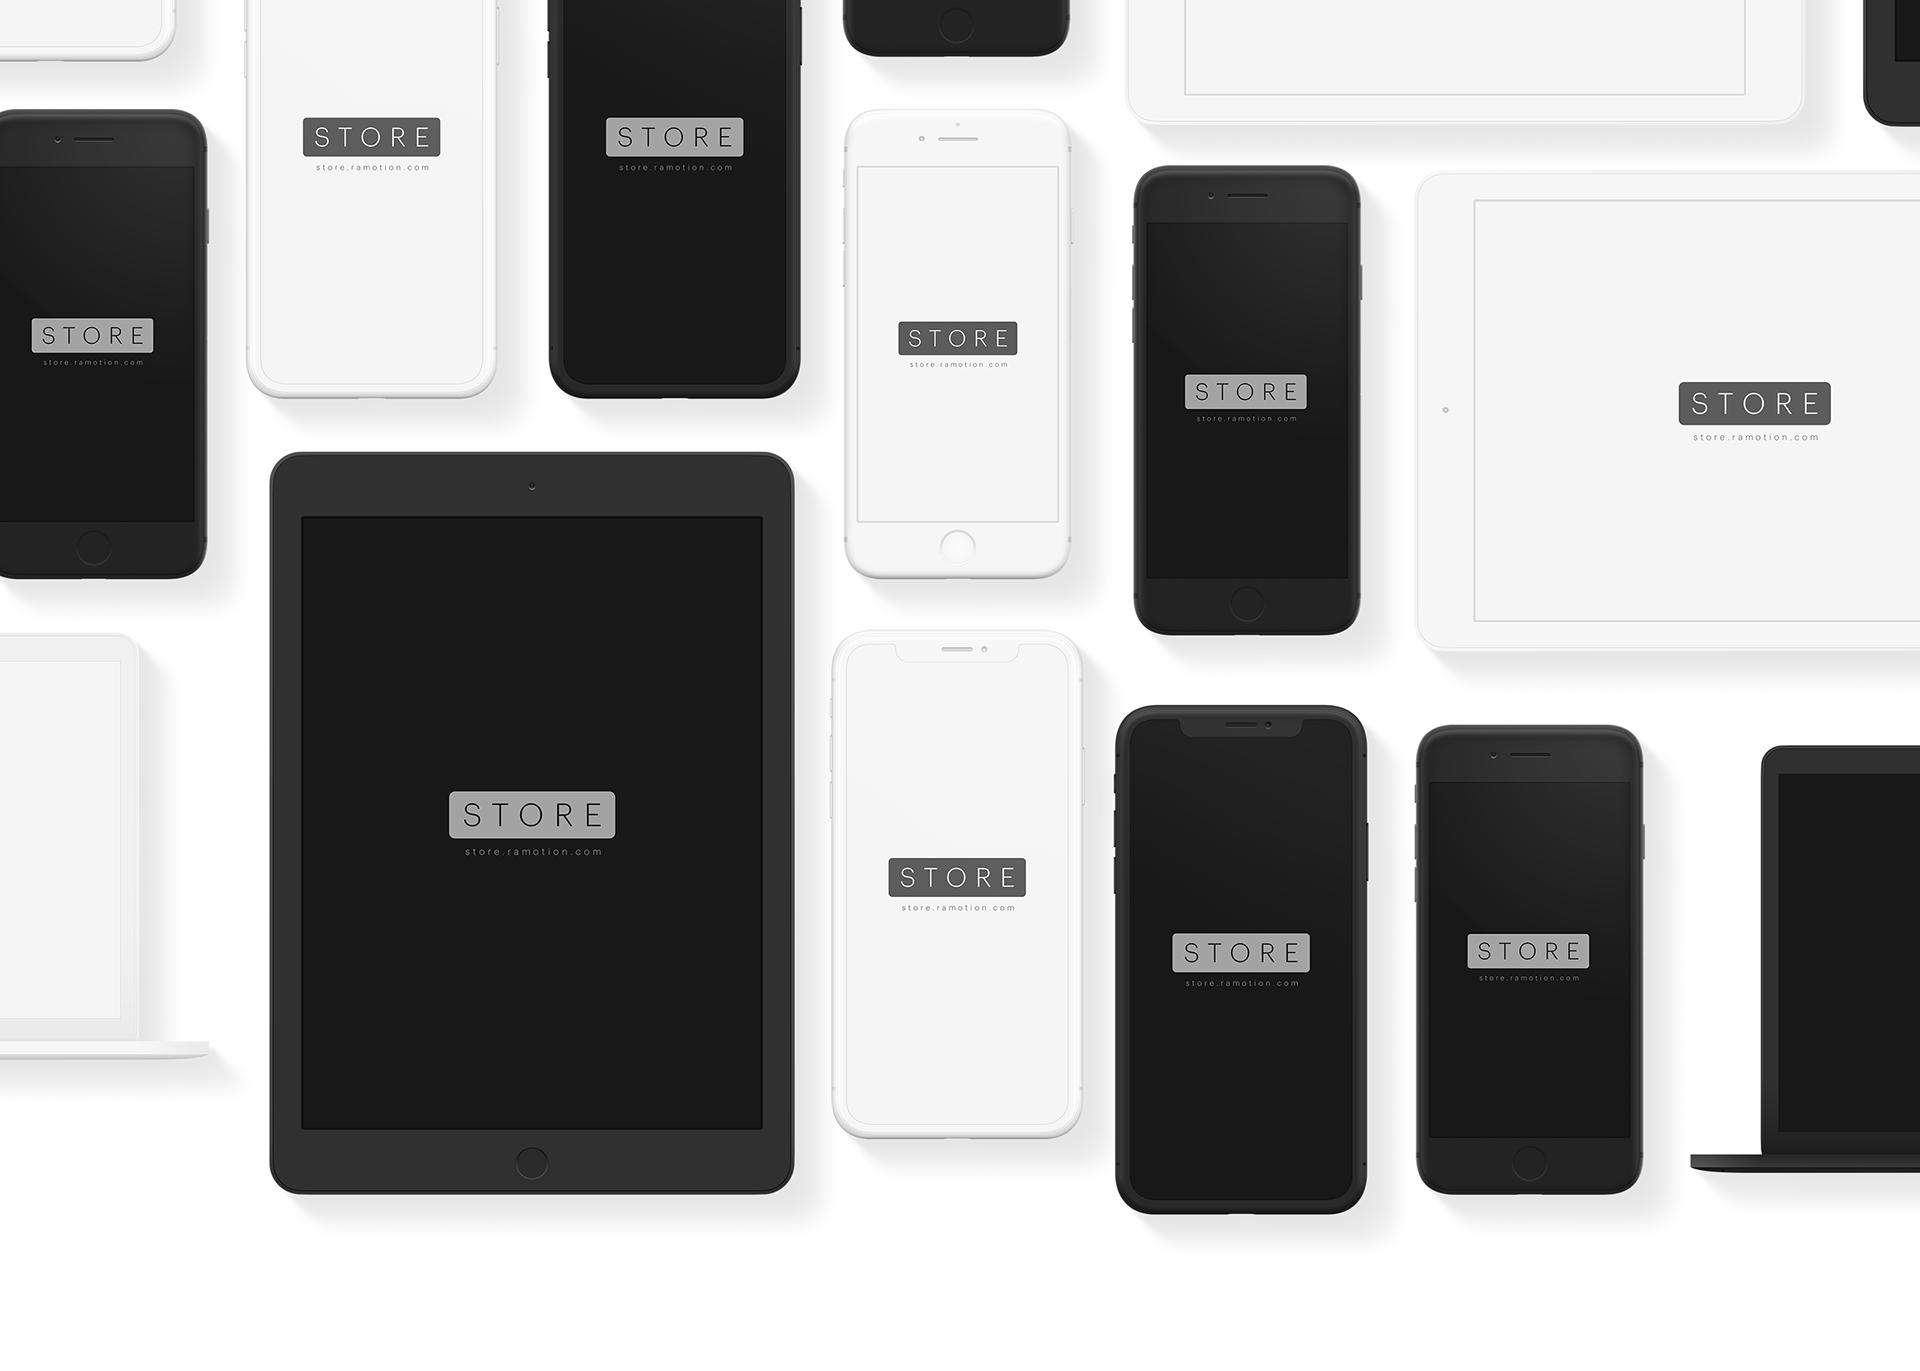 Apple Device Mockups Psd Sketch On Behance Ipad Phone Mockup Mockup